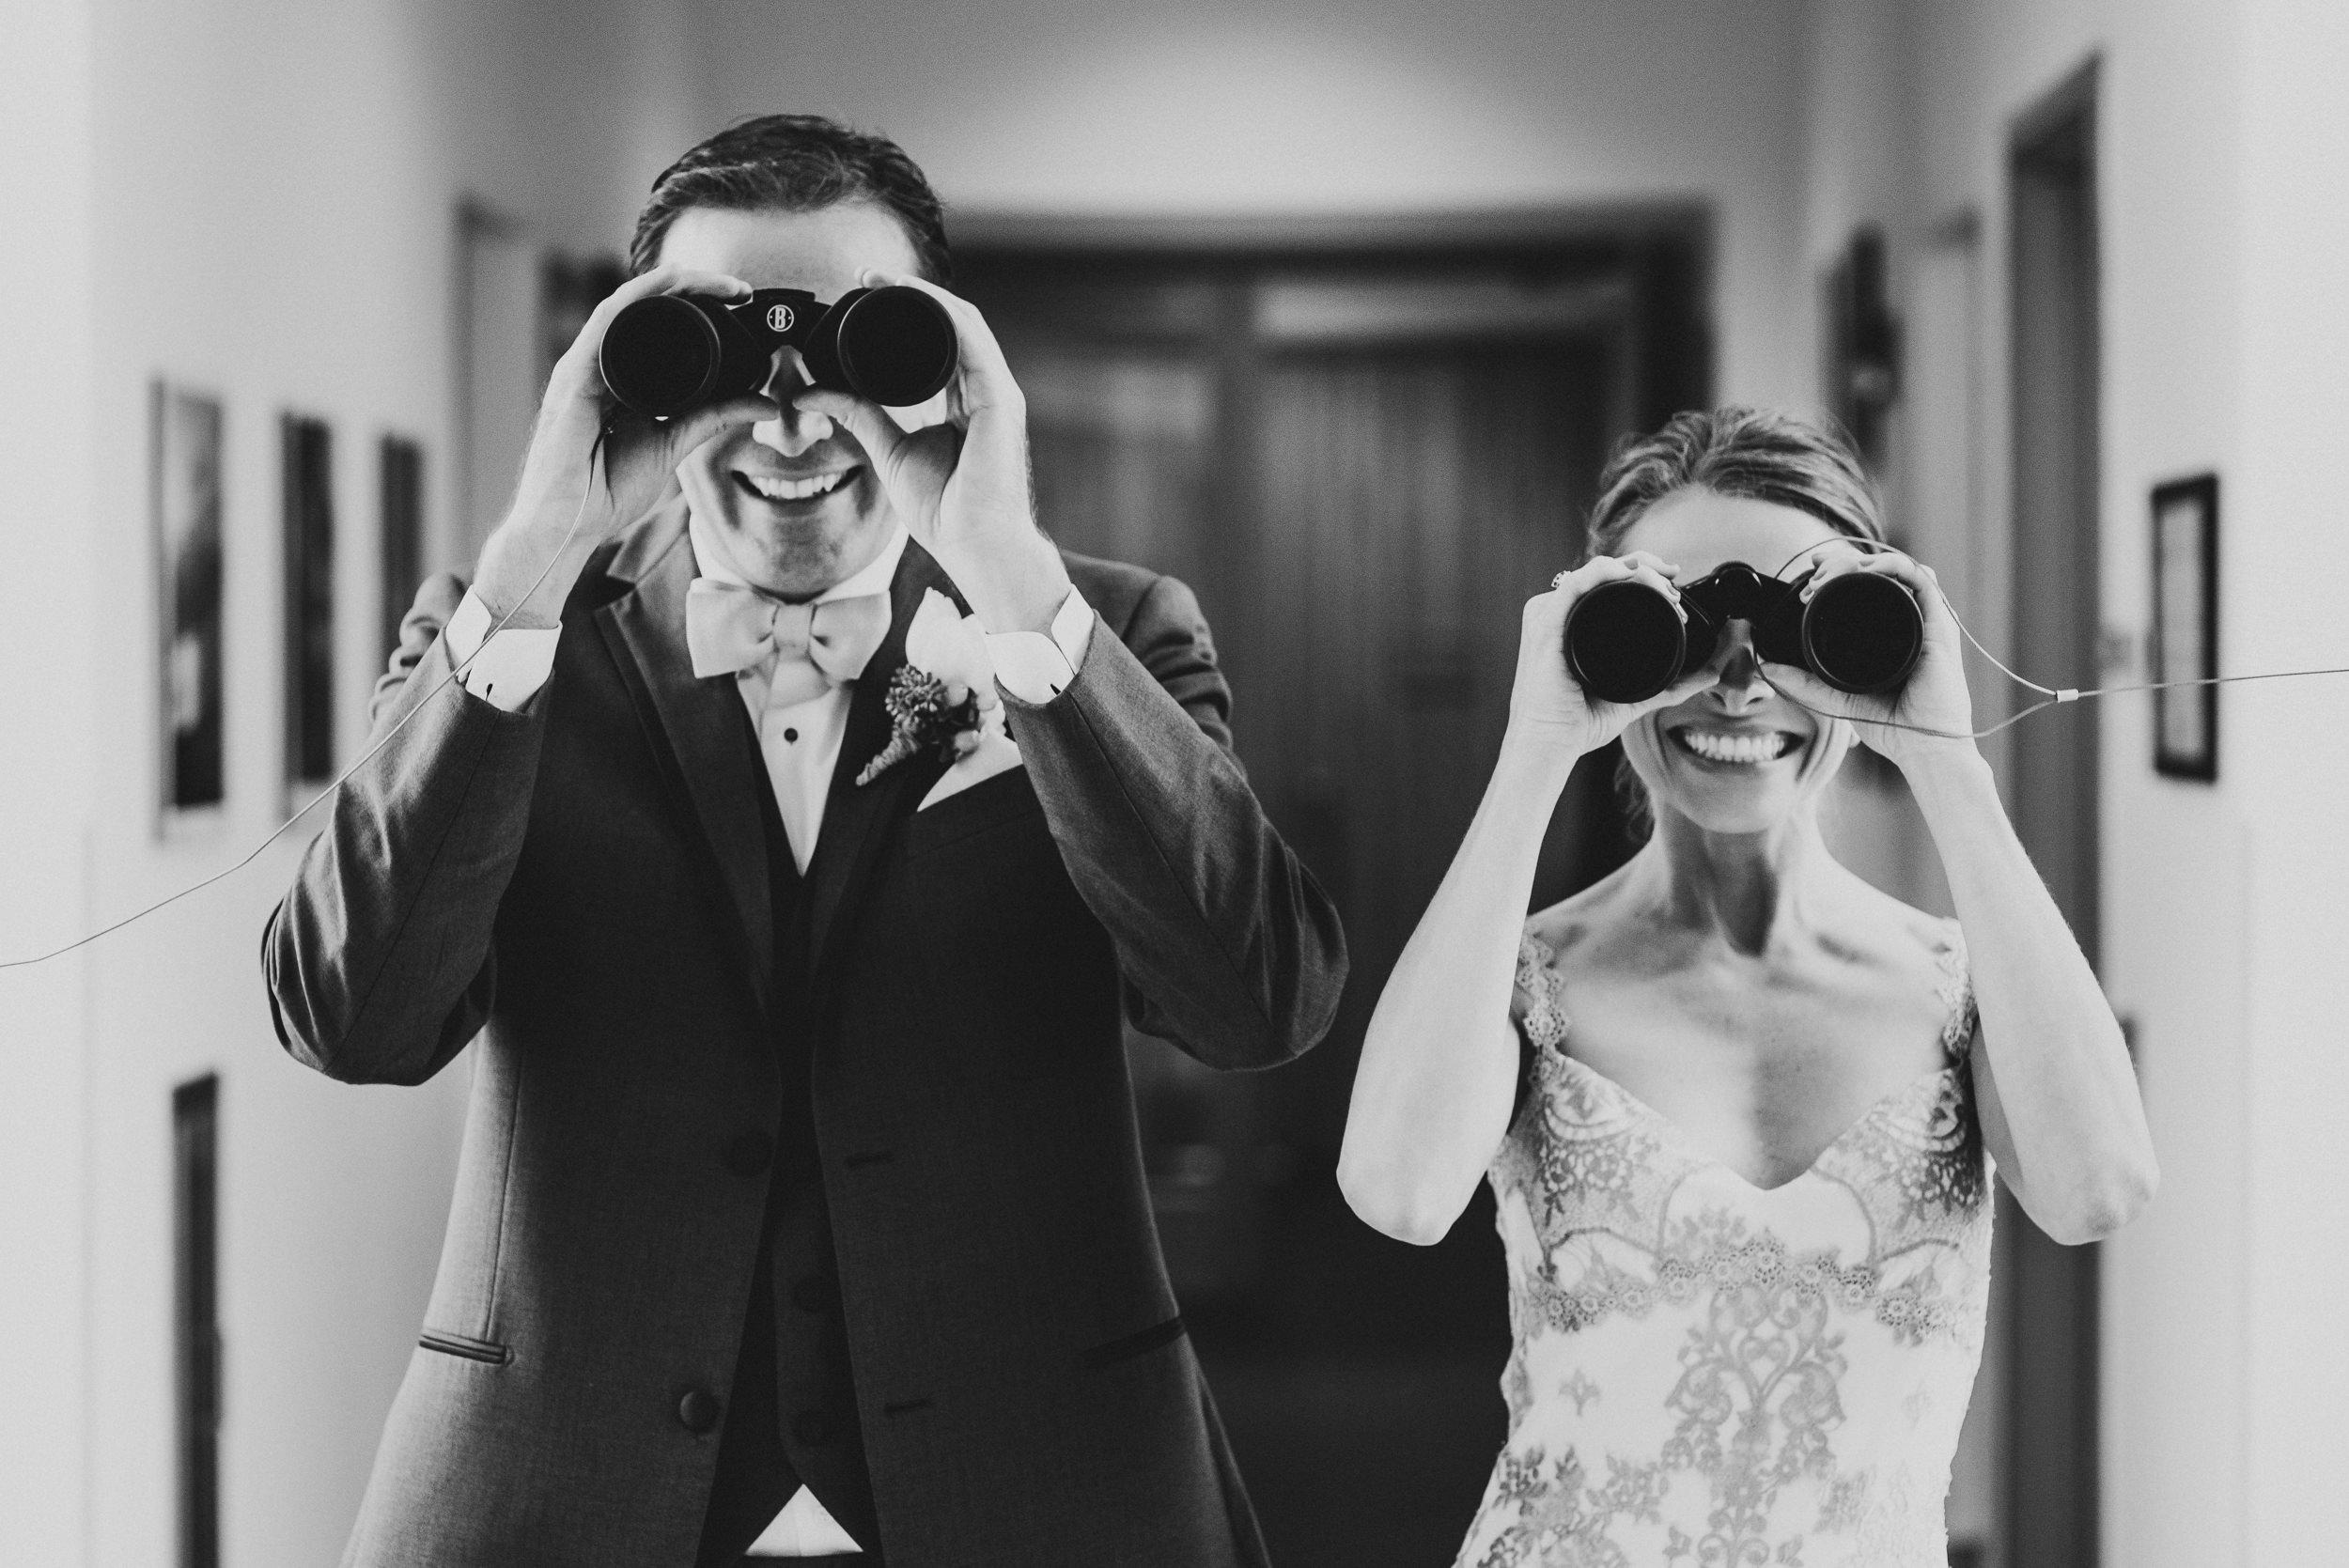 Philip Merrill Environmental Center wedding-10.jpg